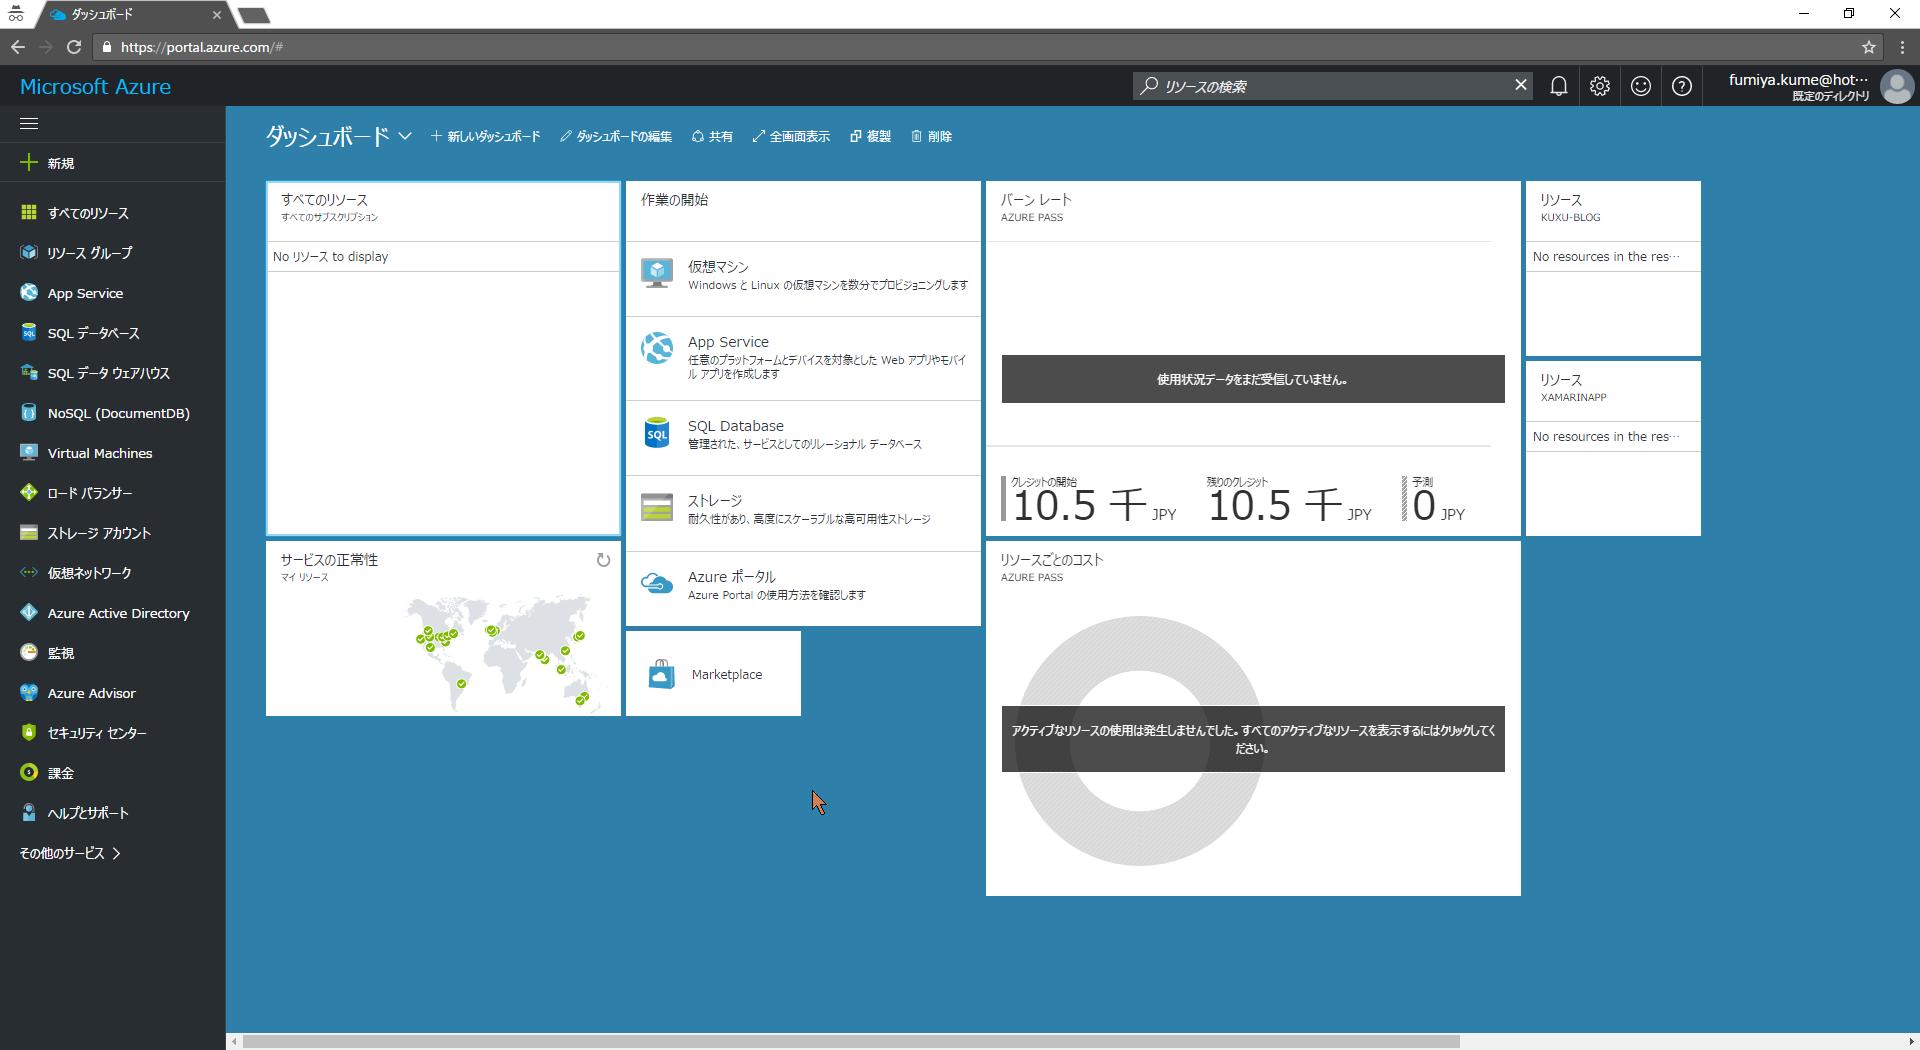 Microsoft Azure の画像